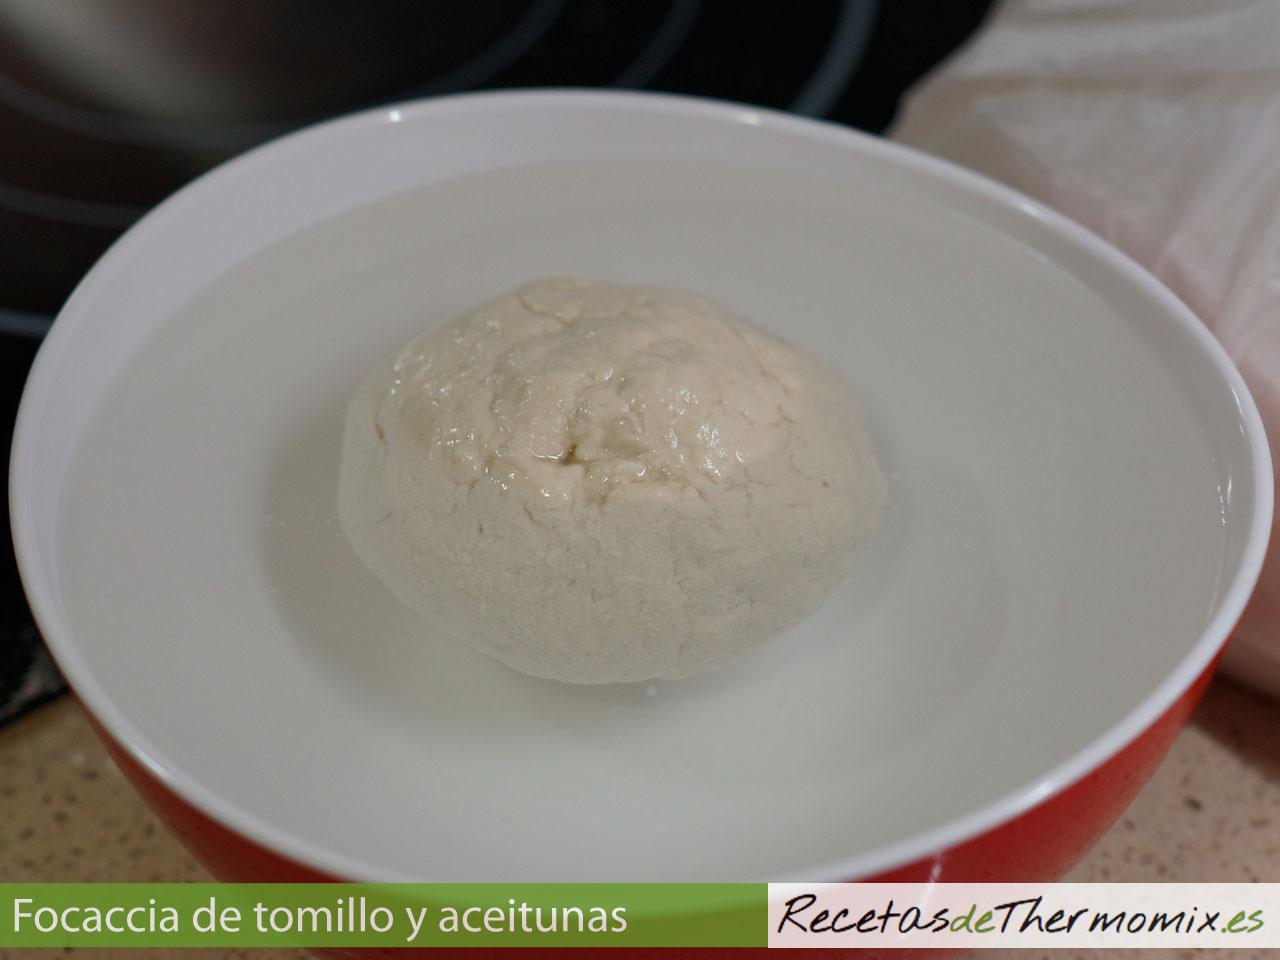 Bola de masa de Focaccia de tomillo y aceitunas con Thermomix